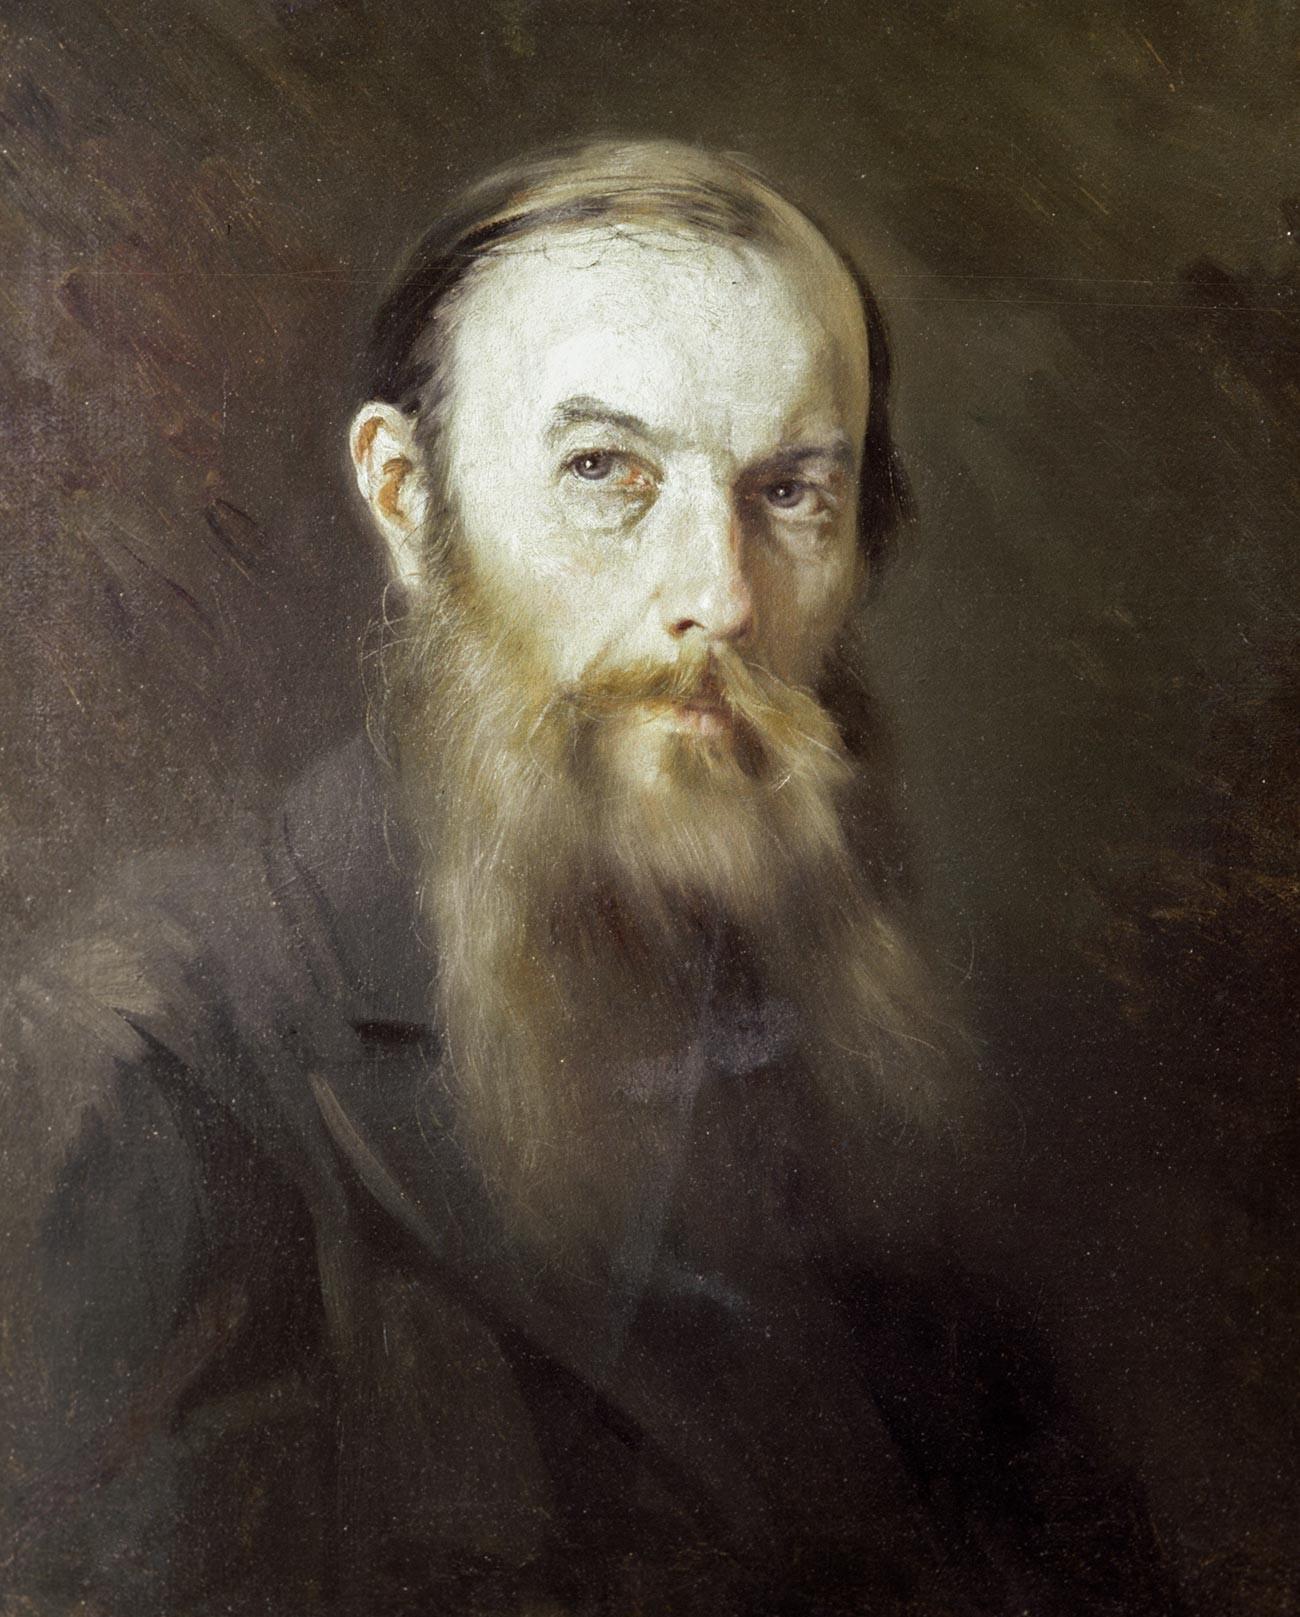 Fiodor Dostoïevski par Mikhaïl Chtcherbatov. Reproduction